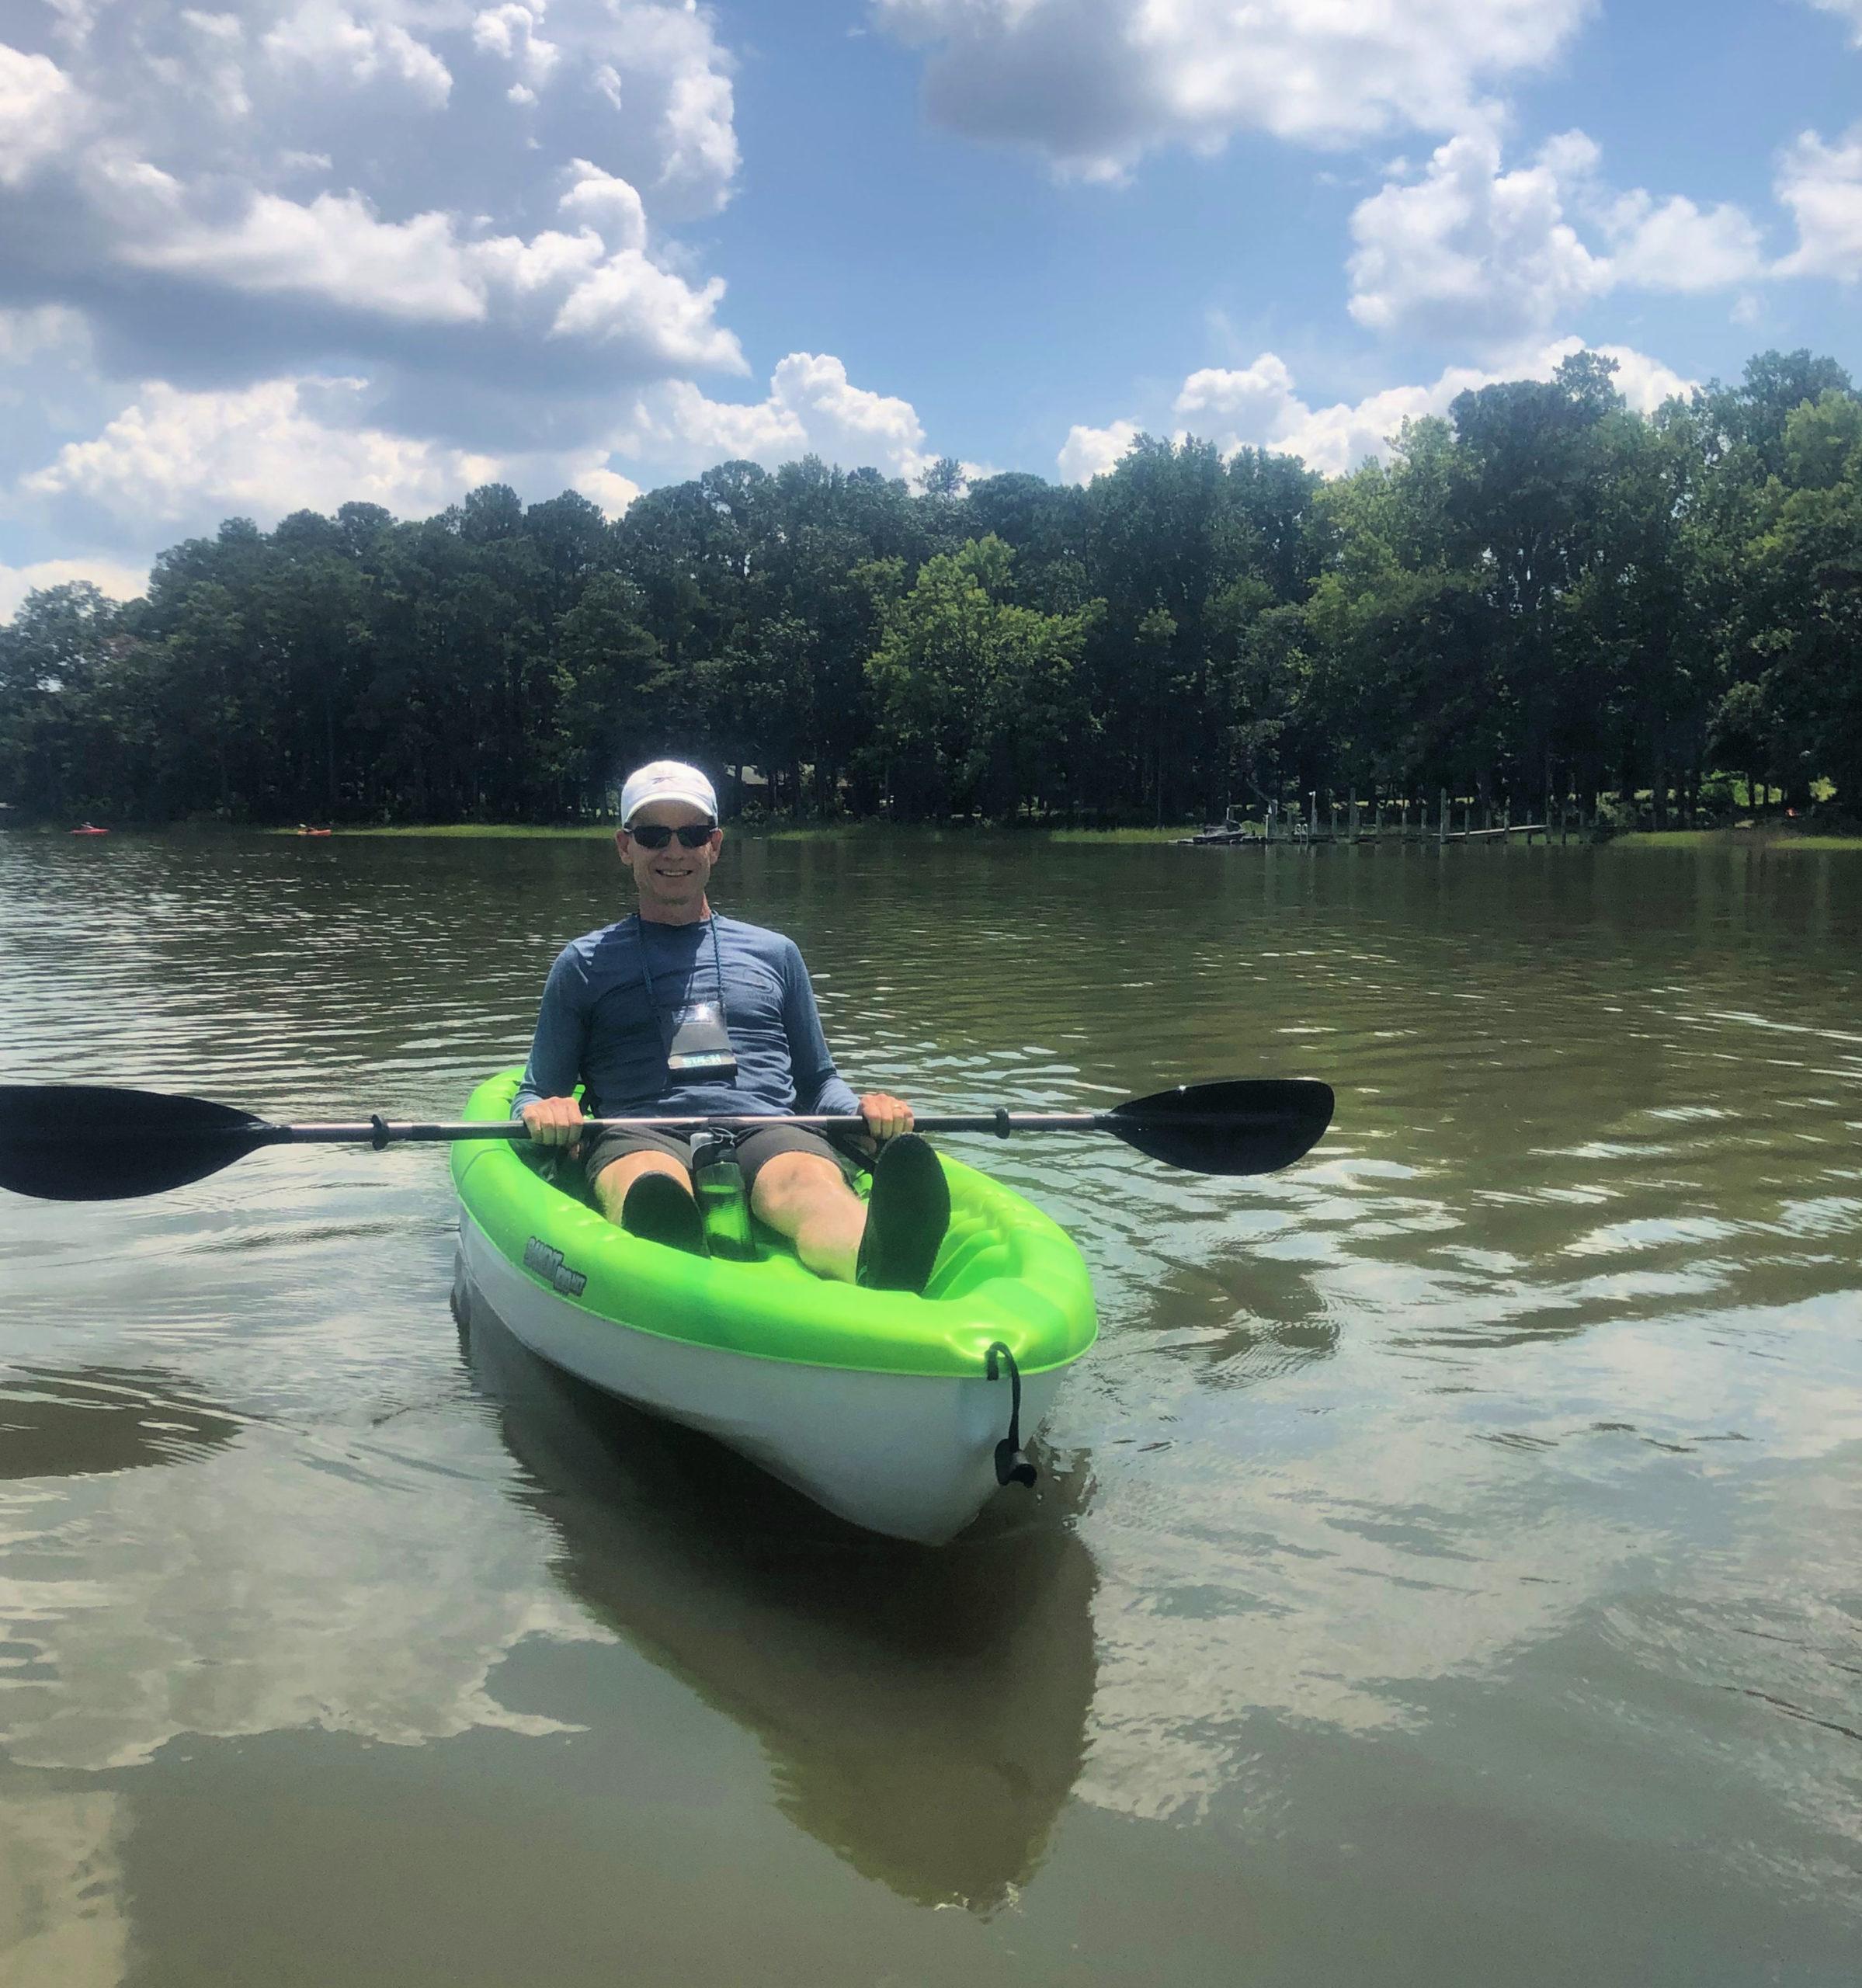 Man floating in a kayak